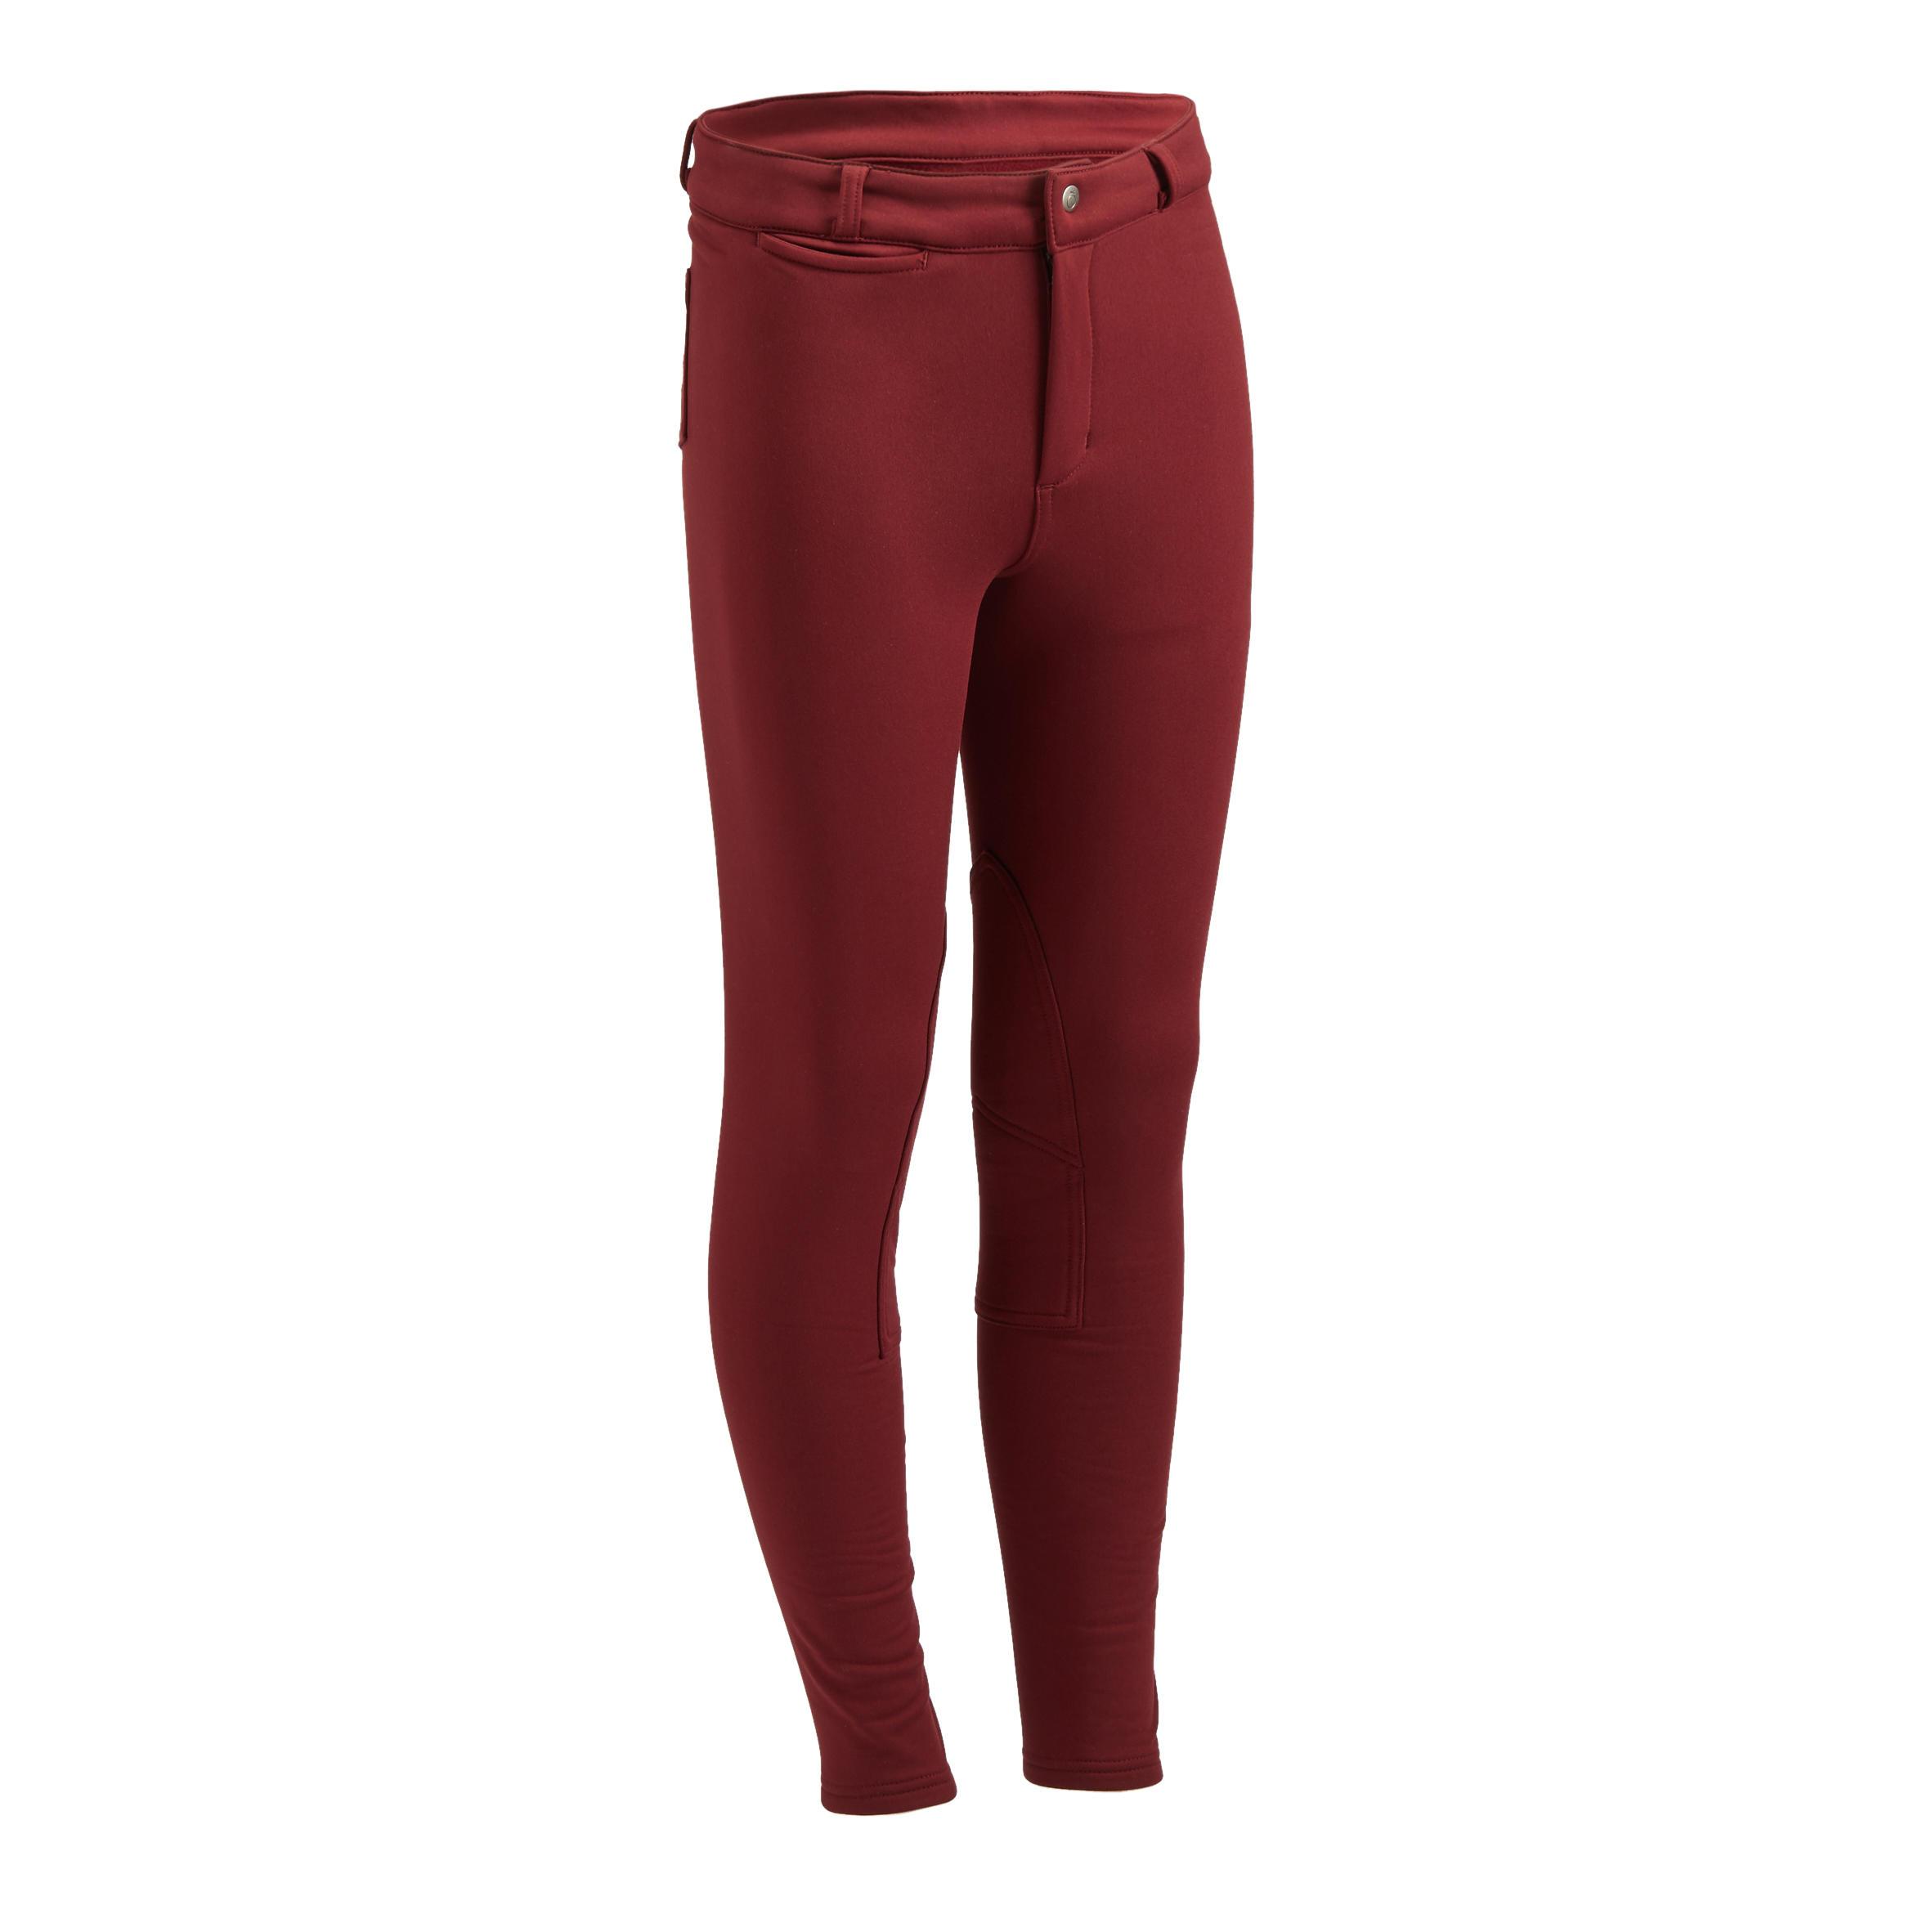 Pantalon 100 WARM Copii imagine